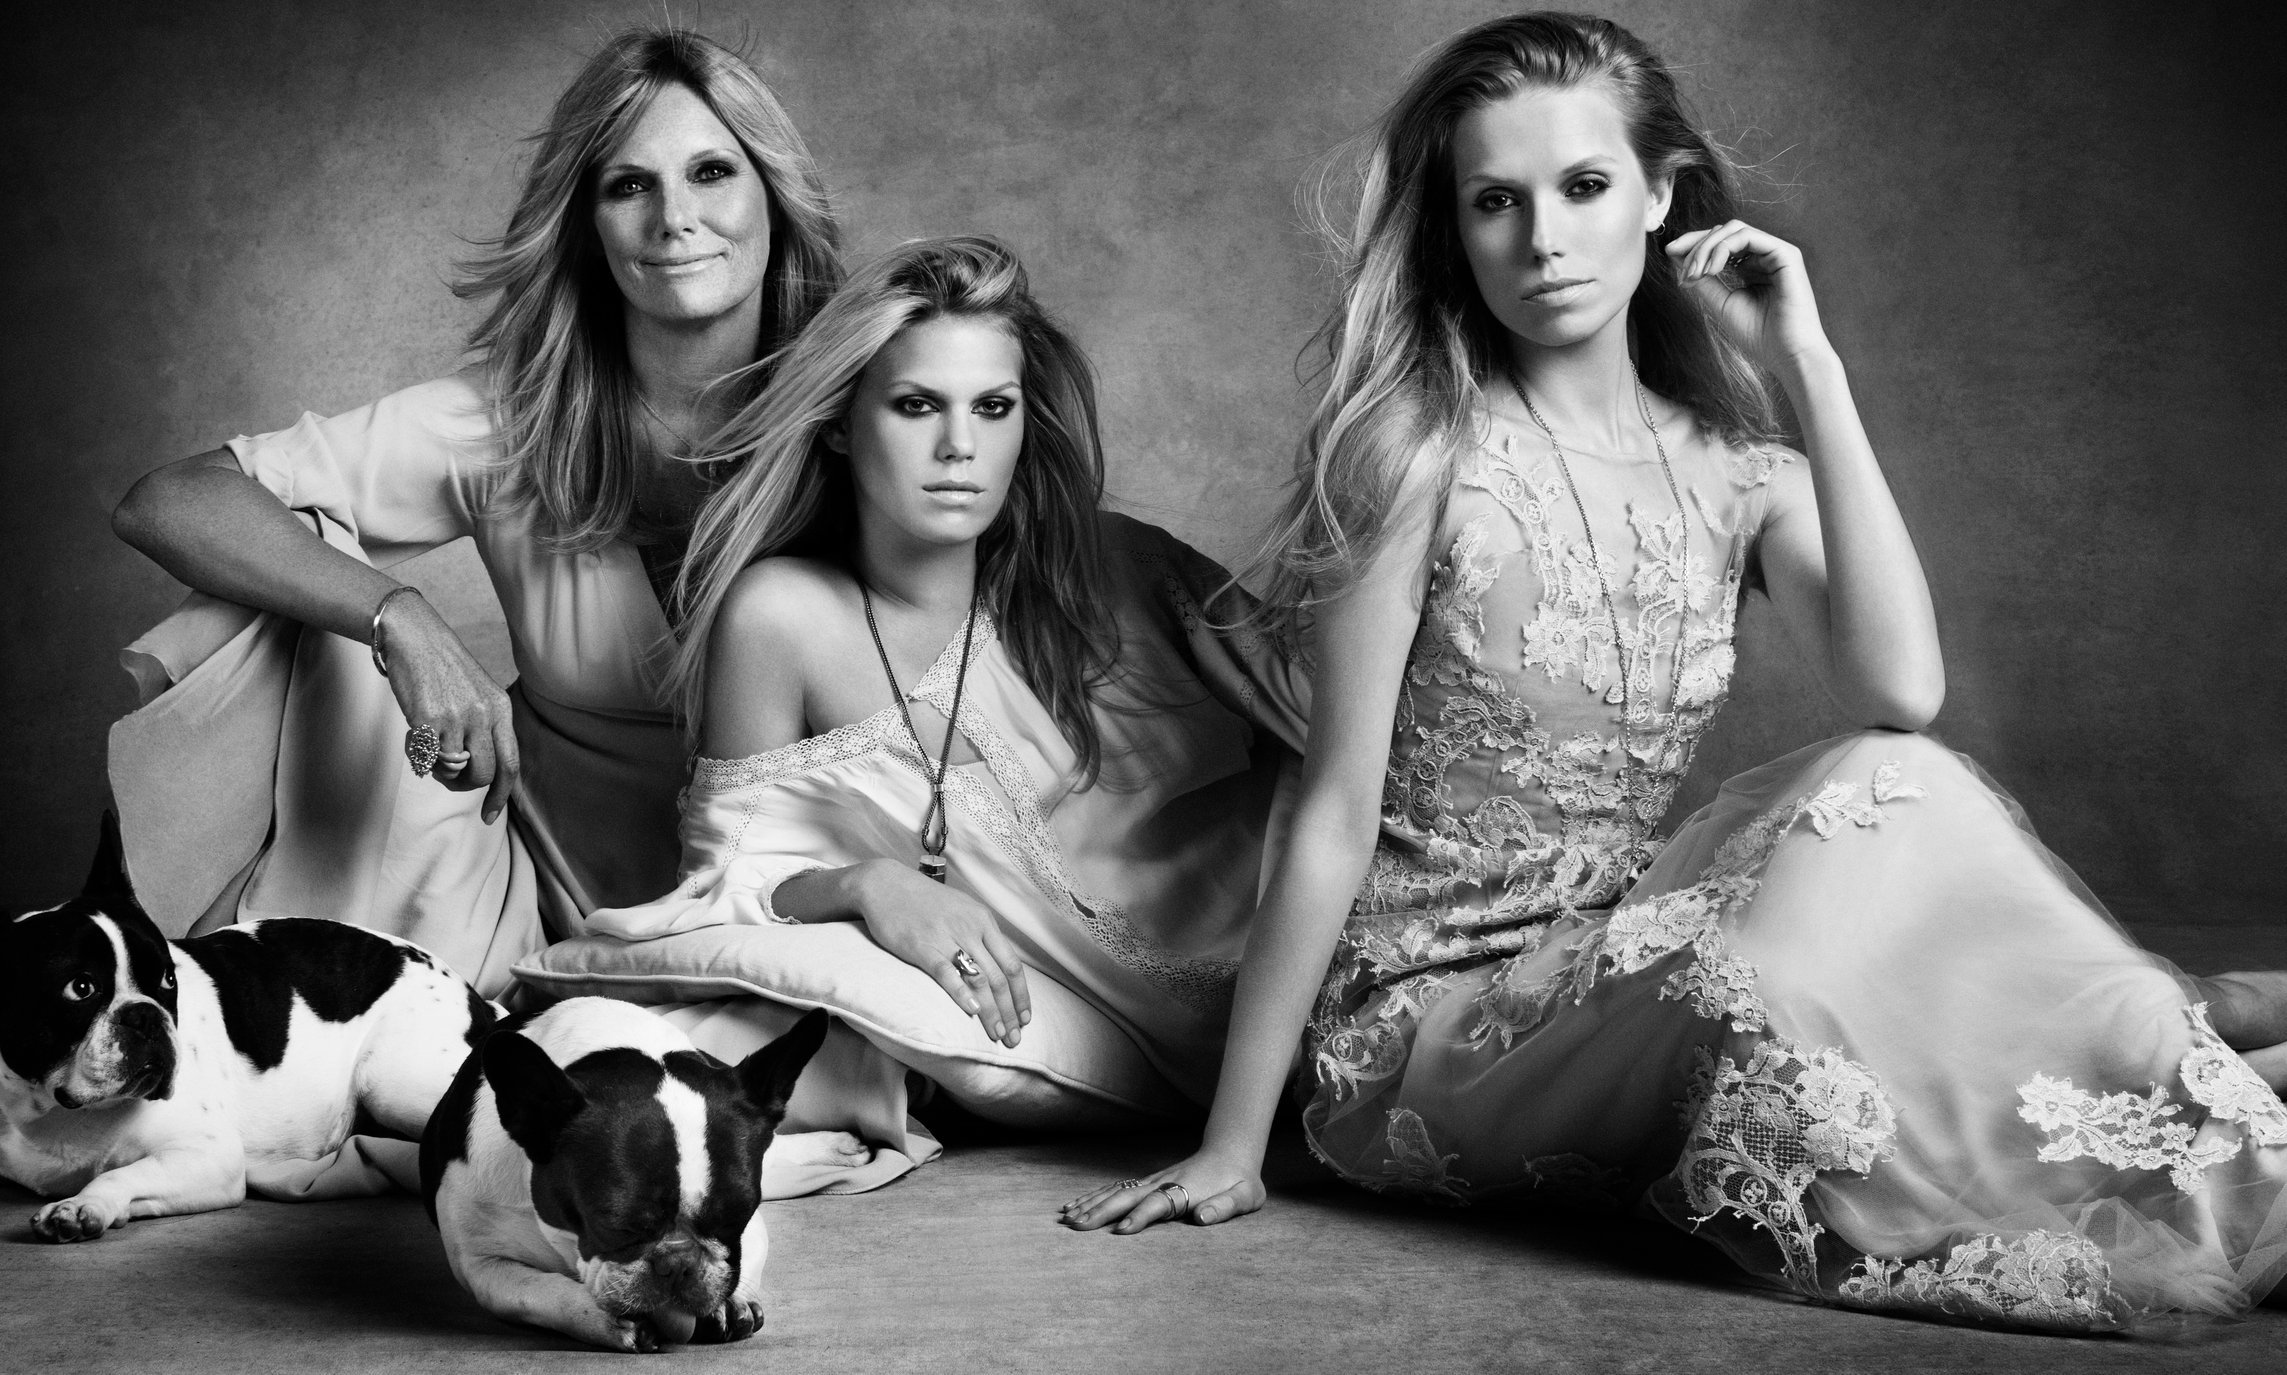 Harper's Bazaar. Patti Hansen, Theodora and Alexandra Richards. Family Affair, May 2013